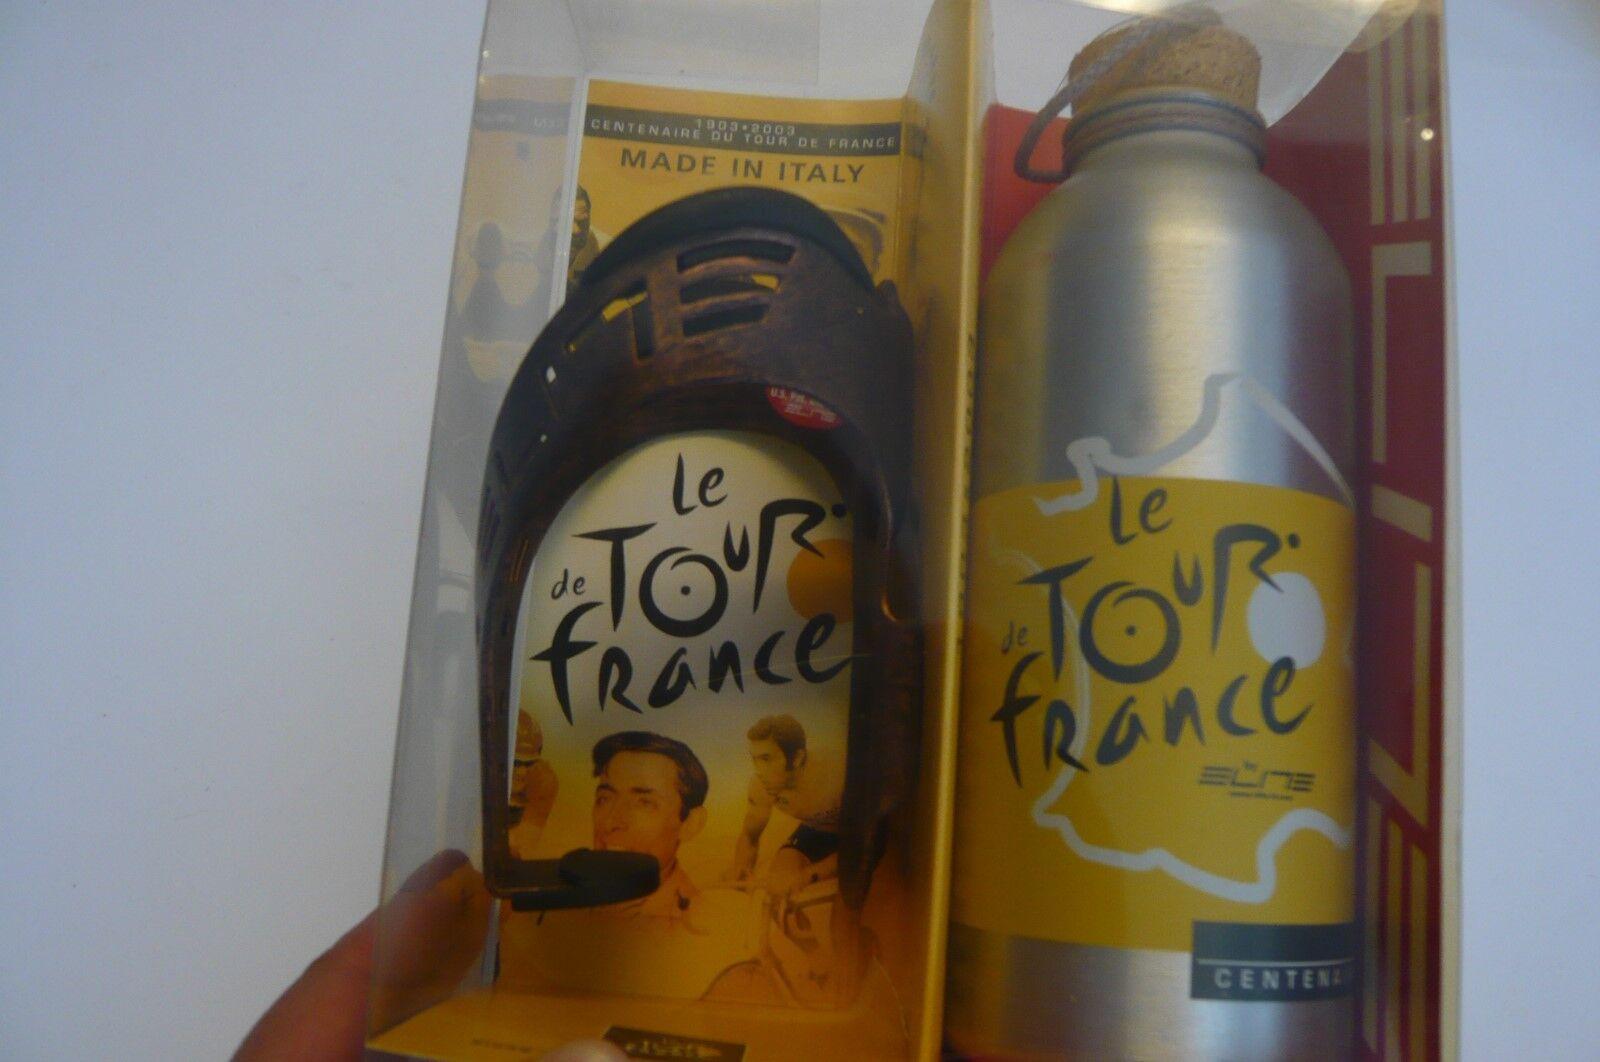 Elite Tour de France 1903-2003 100 th aniversario Bicicleta Botella de agua jaula & Nuevo En Caja